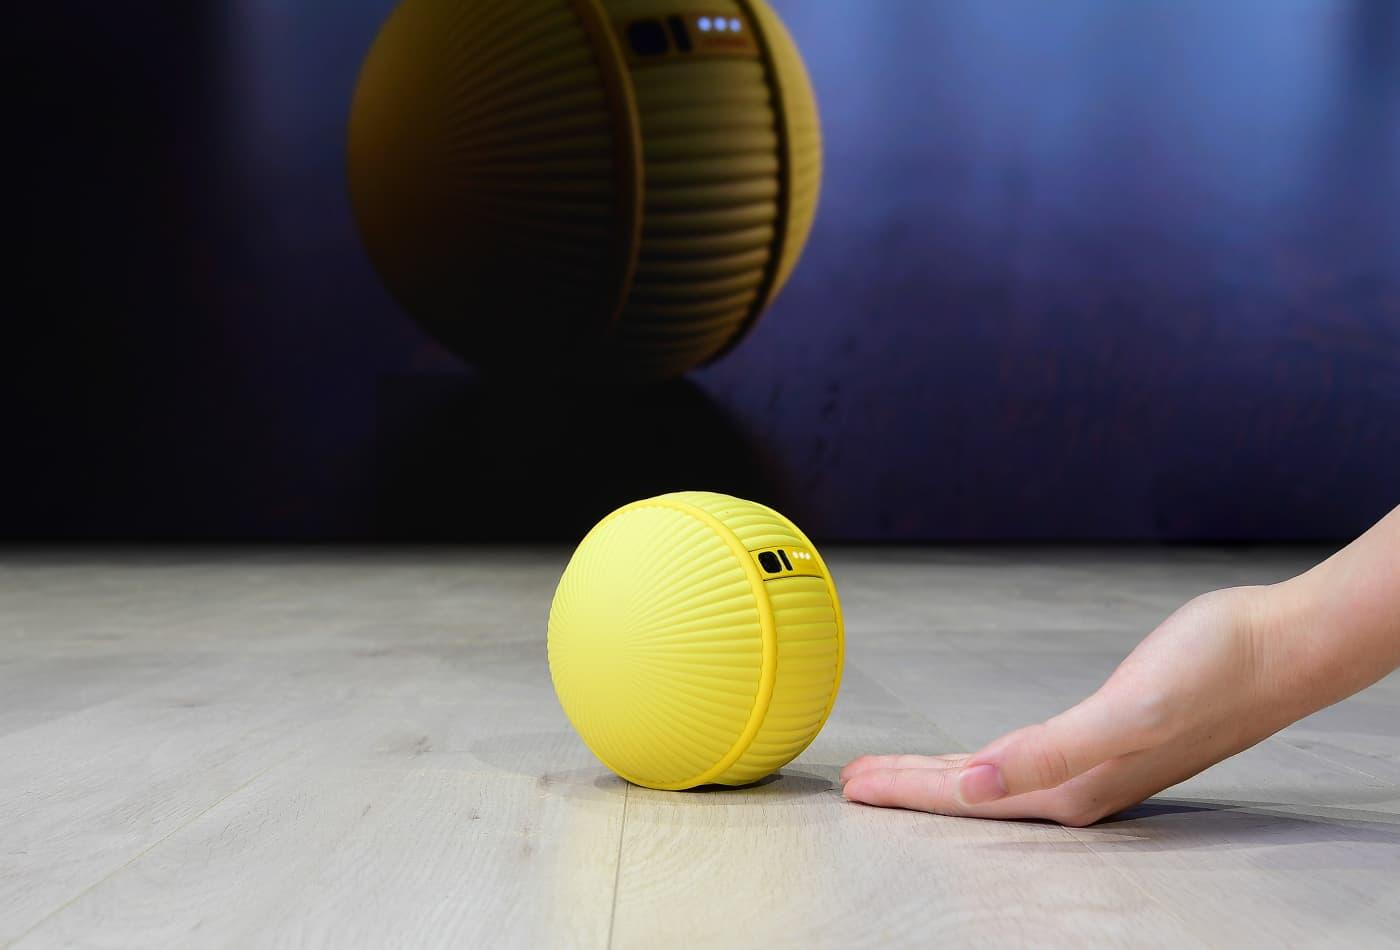 Samsung unveils 'Ballie,' a ball-shaped robot that rolls around your home